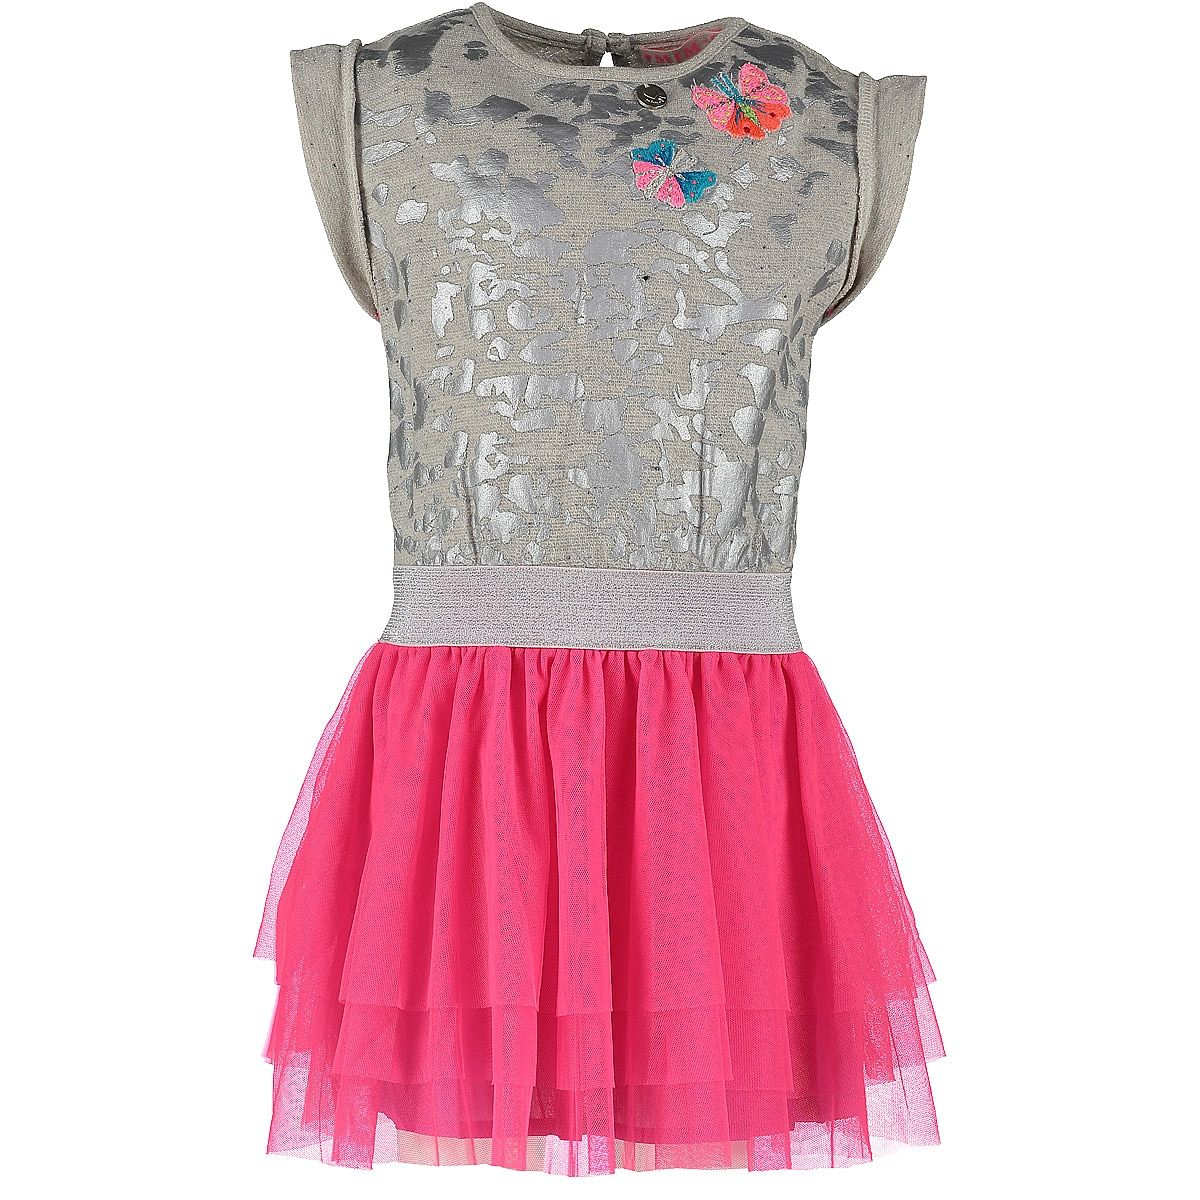 Mim Pi Kinderkleding.Mim Pi Mimpi Kinderkleding Voor Meisjes Koop Je Bij Pucksonline